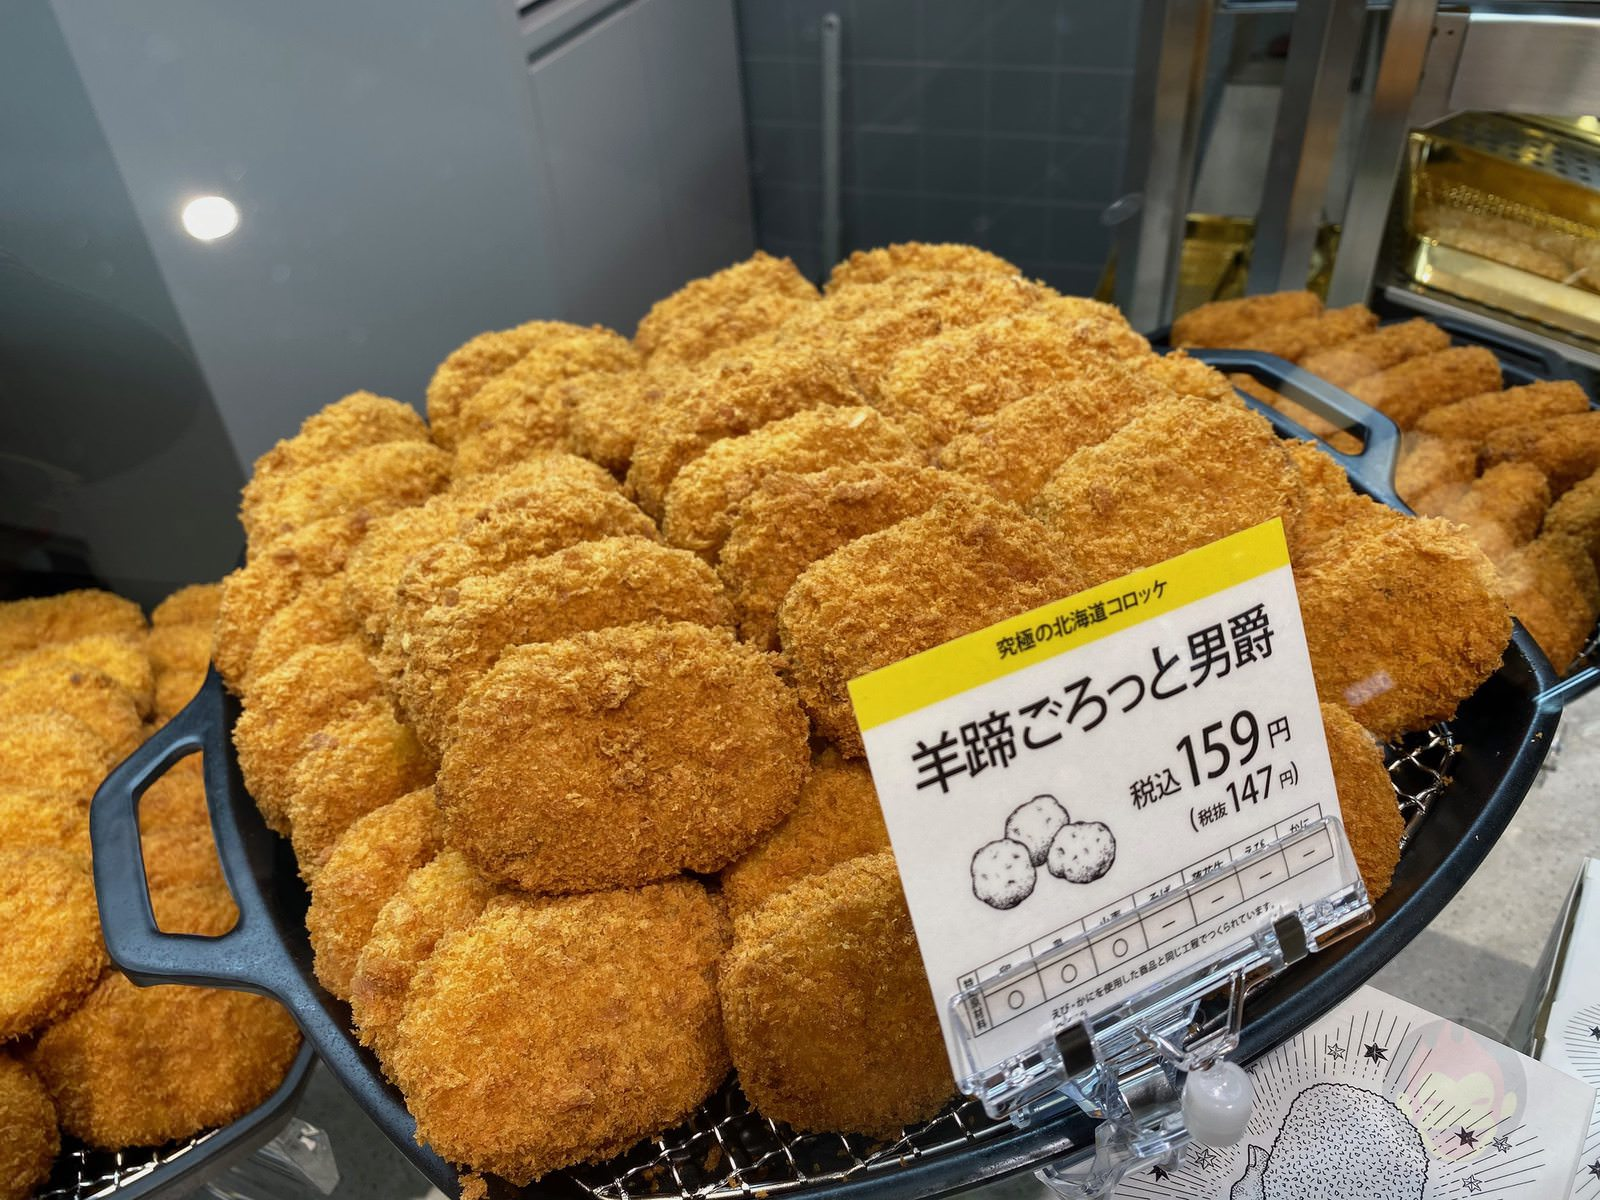 Shibuya-Scramble-Square-Food-I-Ate-160.jpeg